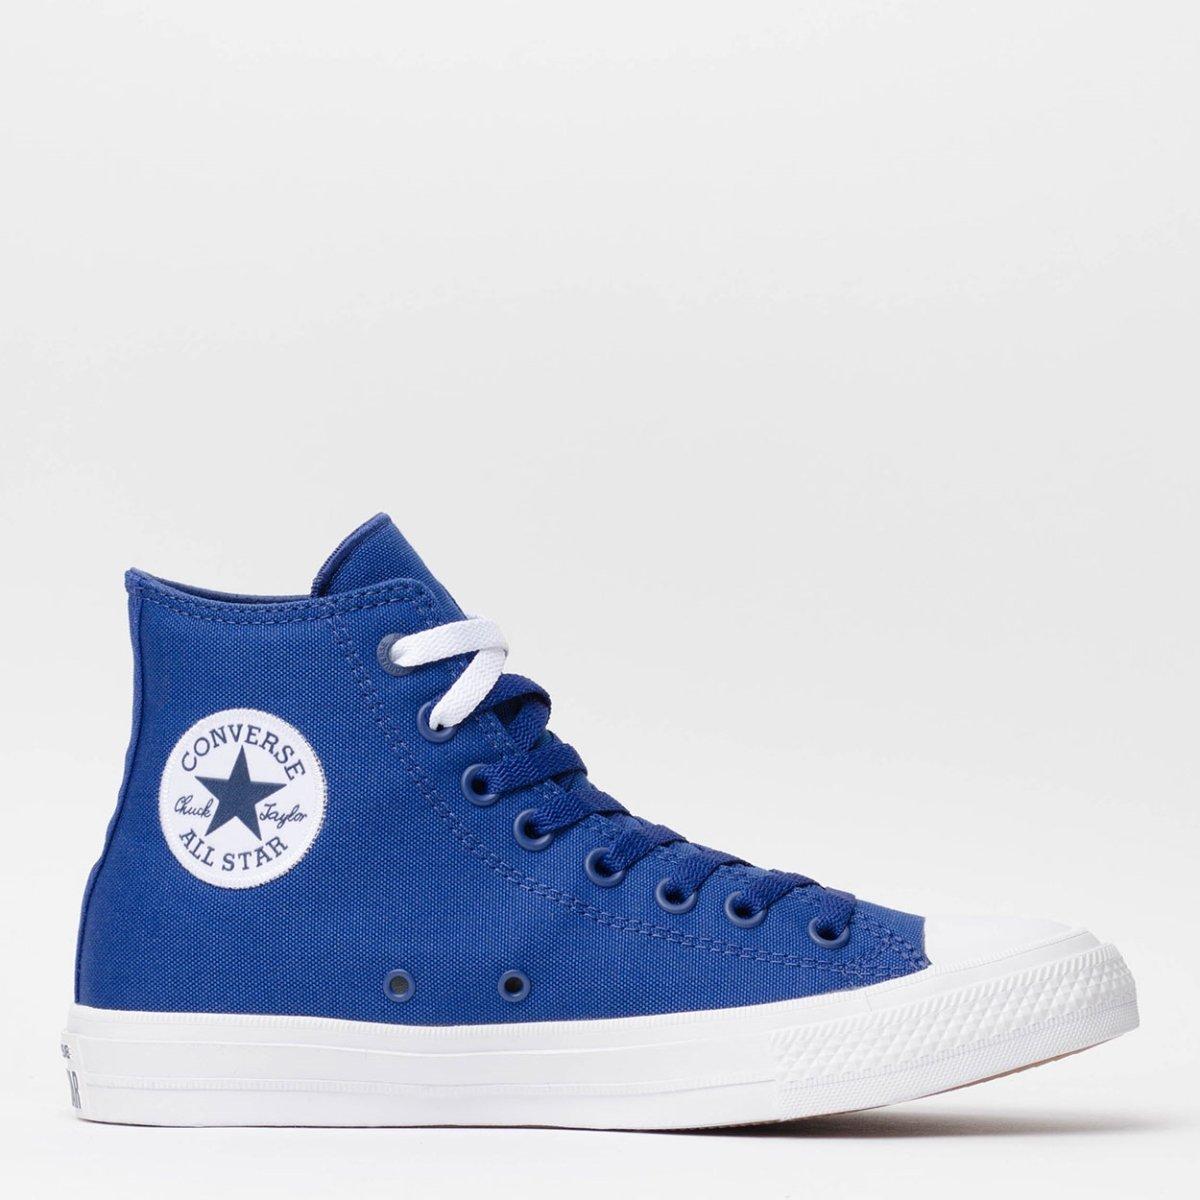 All Taylor Tênis Azul Converse Tênis Star Converse Chuck qzXzwZ